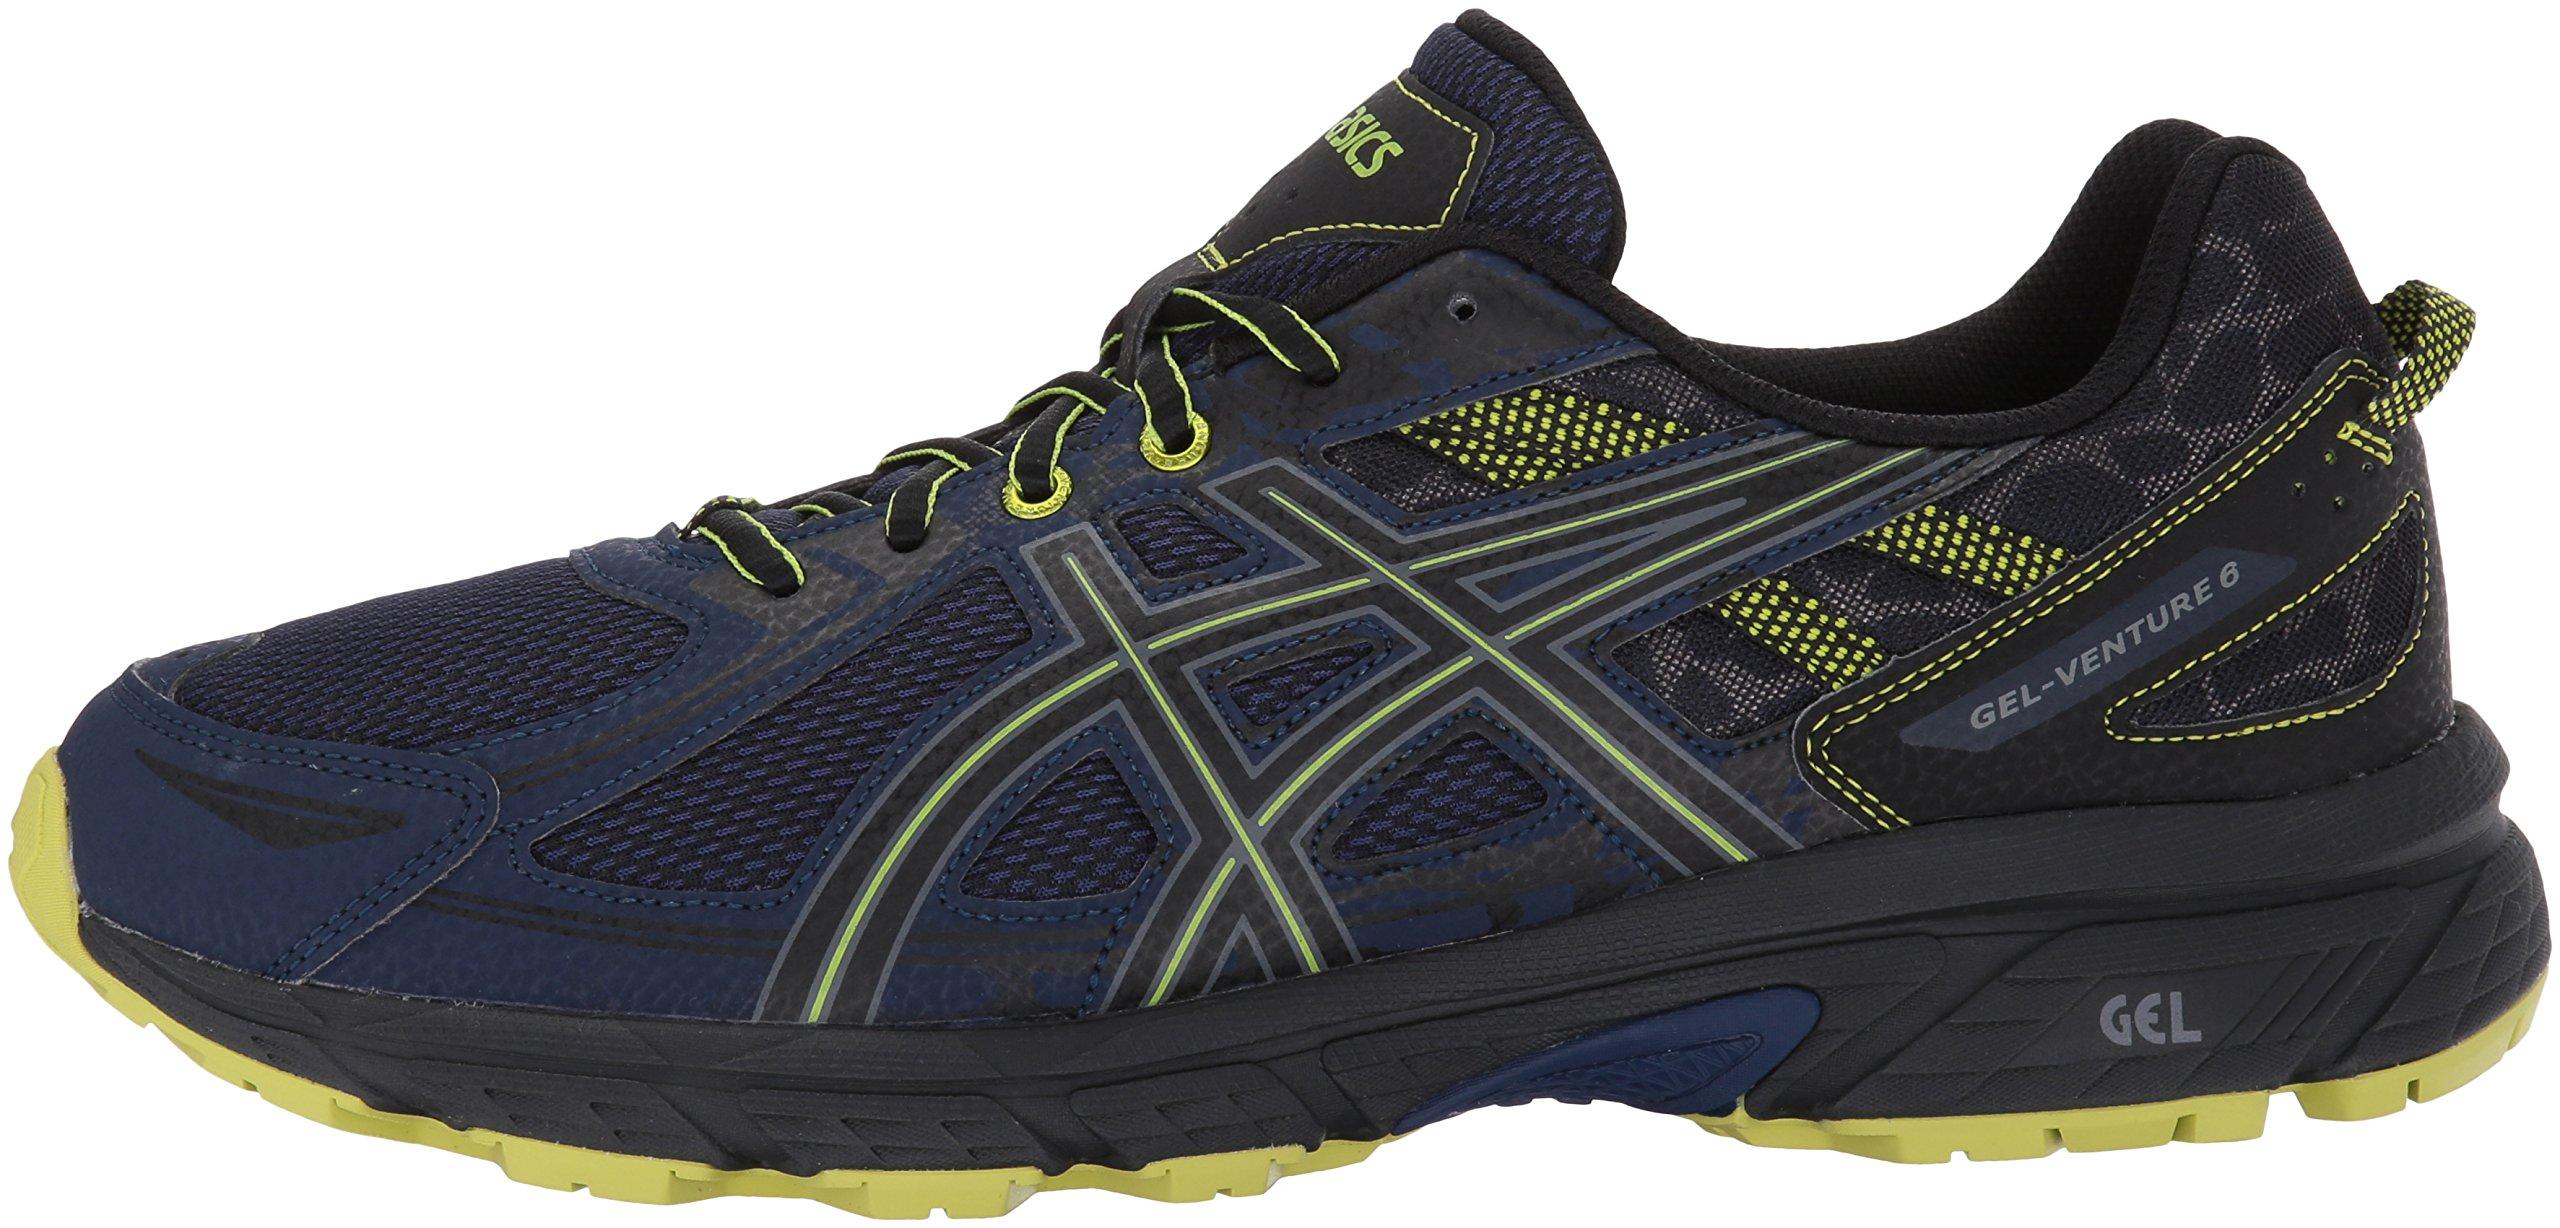 ASICS Mens Gel-Venture 6 Running Shoe, Indigo Blue/Black/Energy Green, 7 Medium US by ASICS (Image #5)